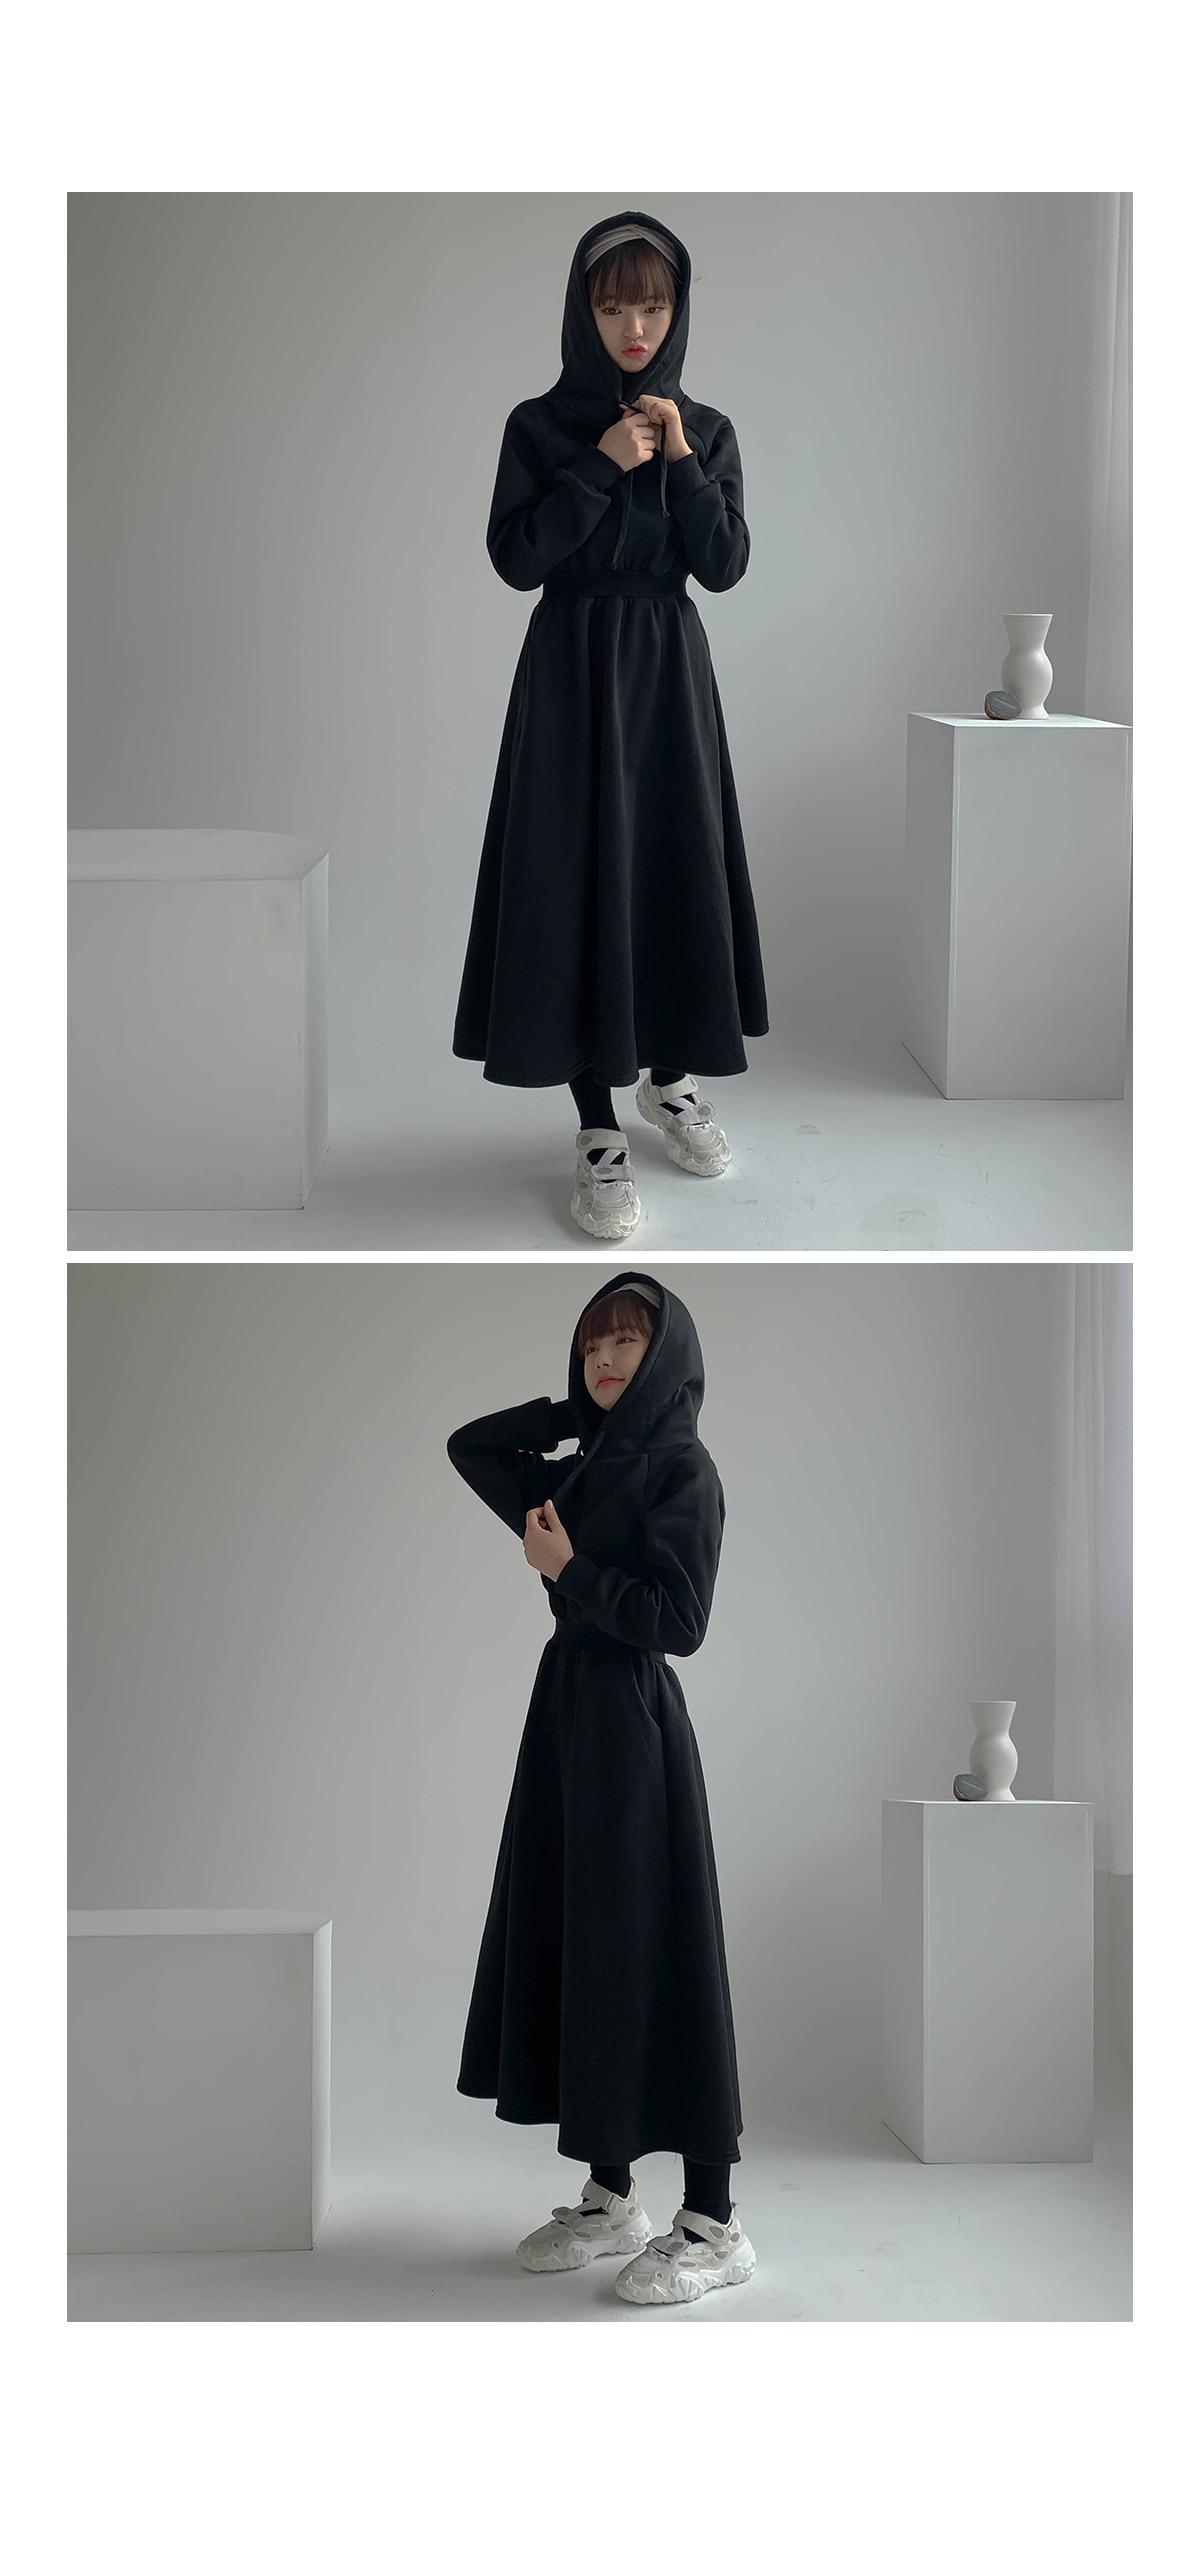 Brushed Sandy Hooded Long Dress